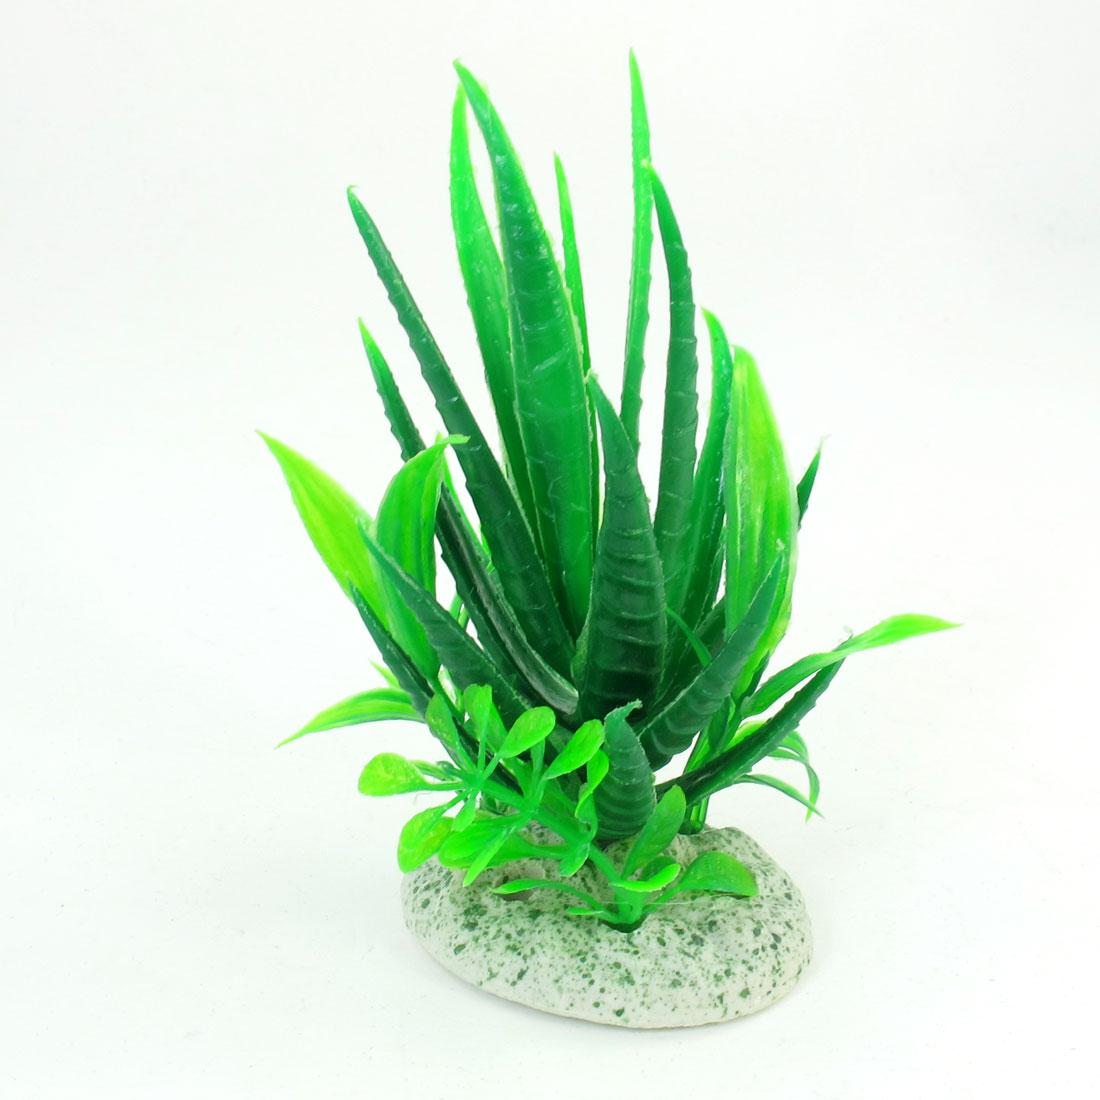 "4.7"" Height Underwater Green Plastic Grass Plant Ornament for Aquarium"